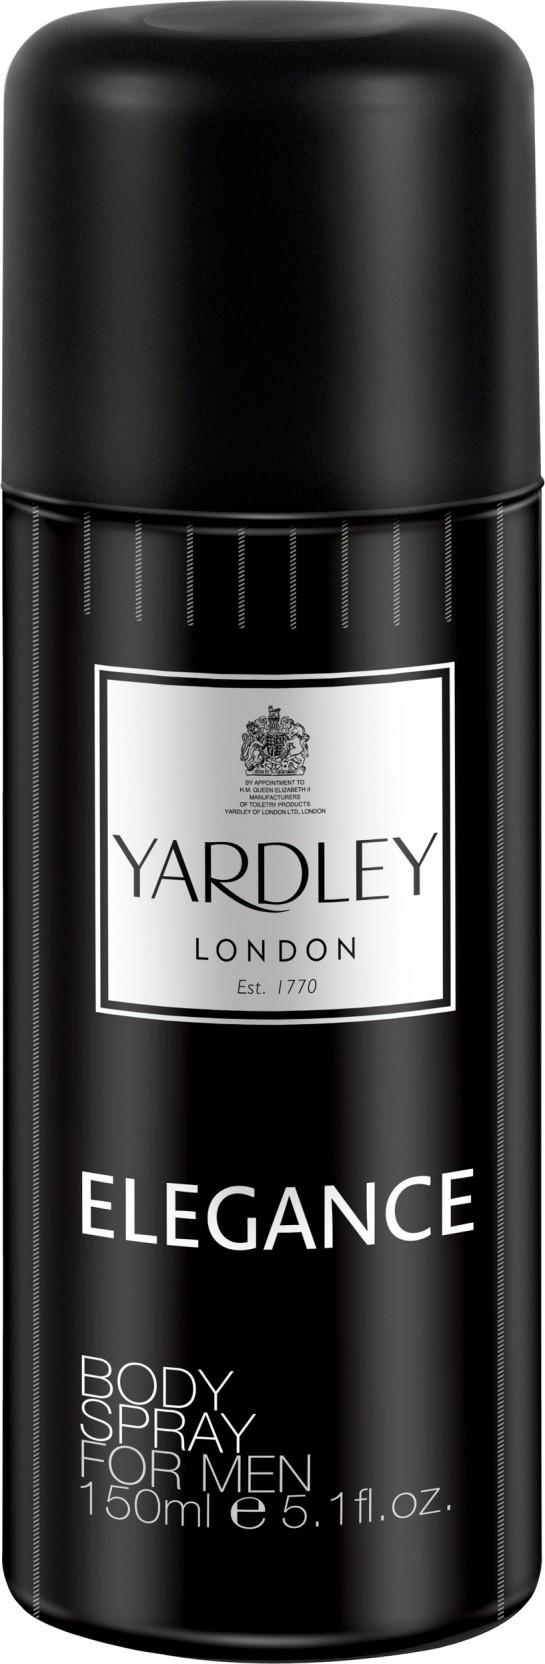 Yardley London Elegance Deodorant Spray For Men Price In India Bri Edt 125 Ml Add To Cart